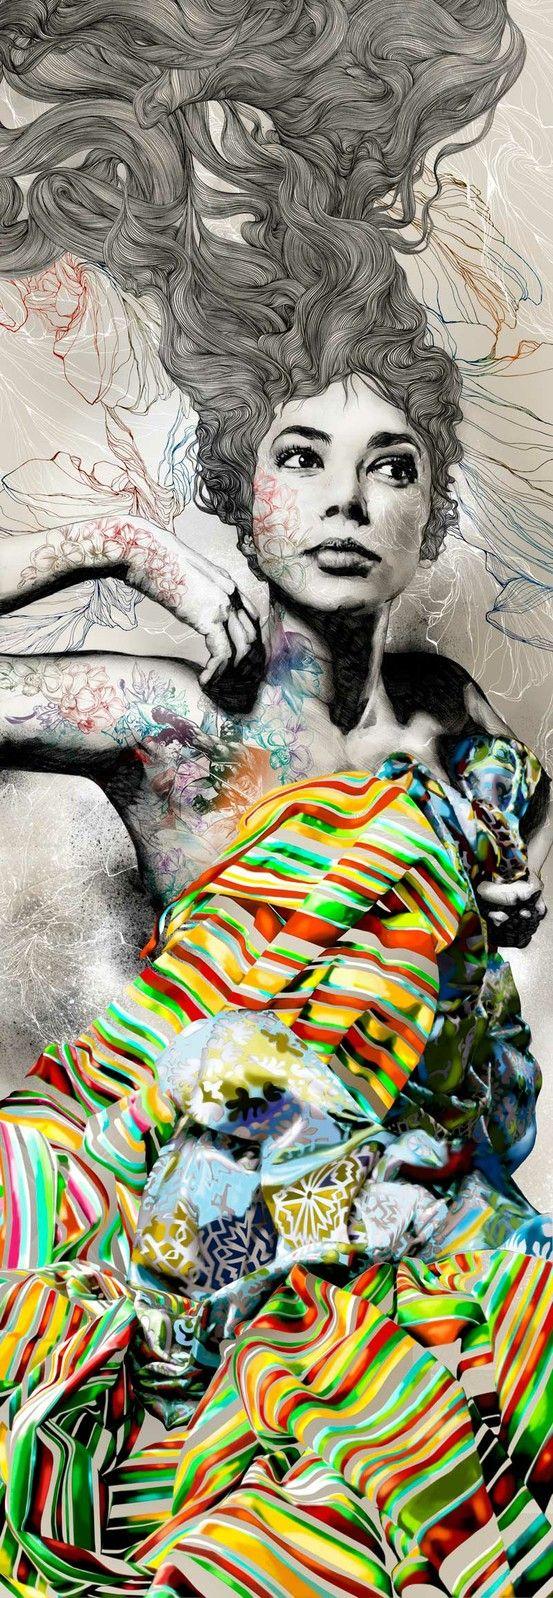 Gabriel Moreno.: Madrid Spain, Urban Art, Illustration, Street Art, Mixed Media, Colors Pencil, Portraits, Painting, Gabriel Moreno